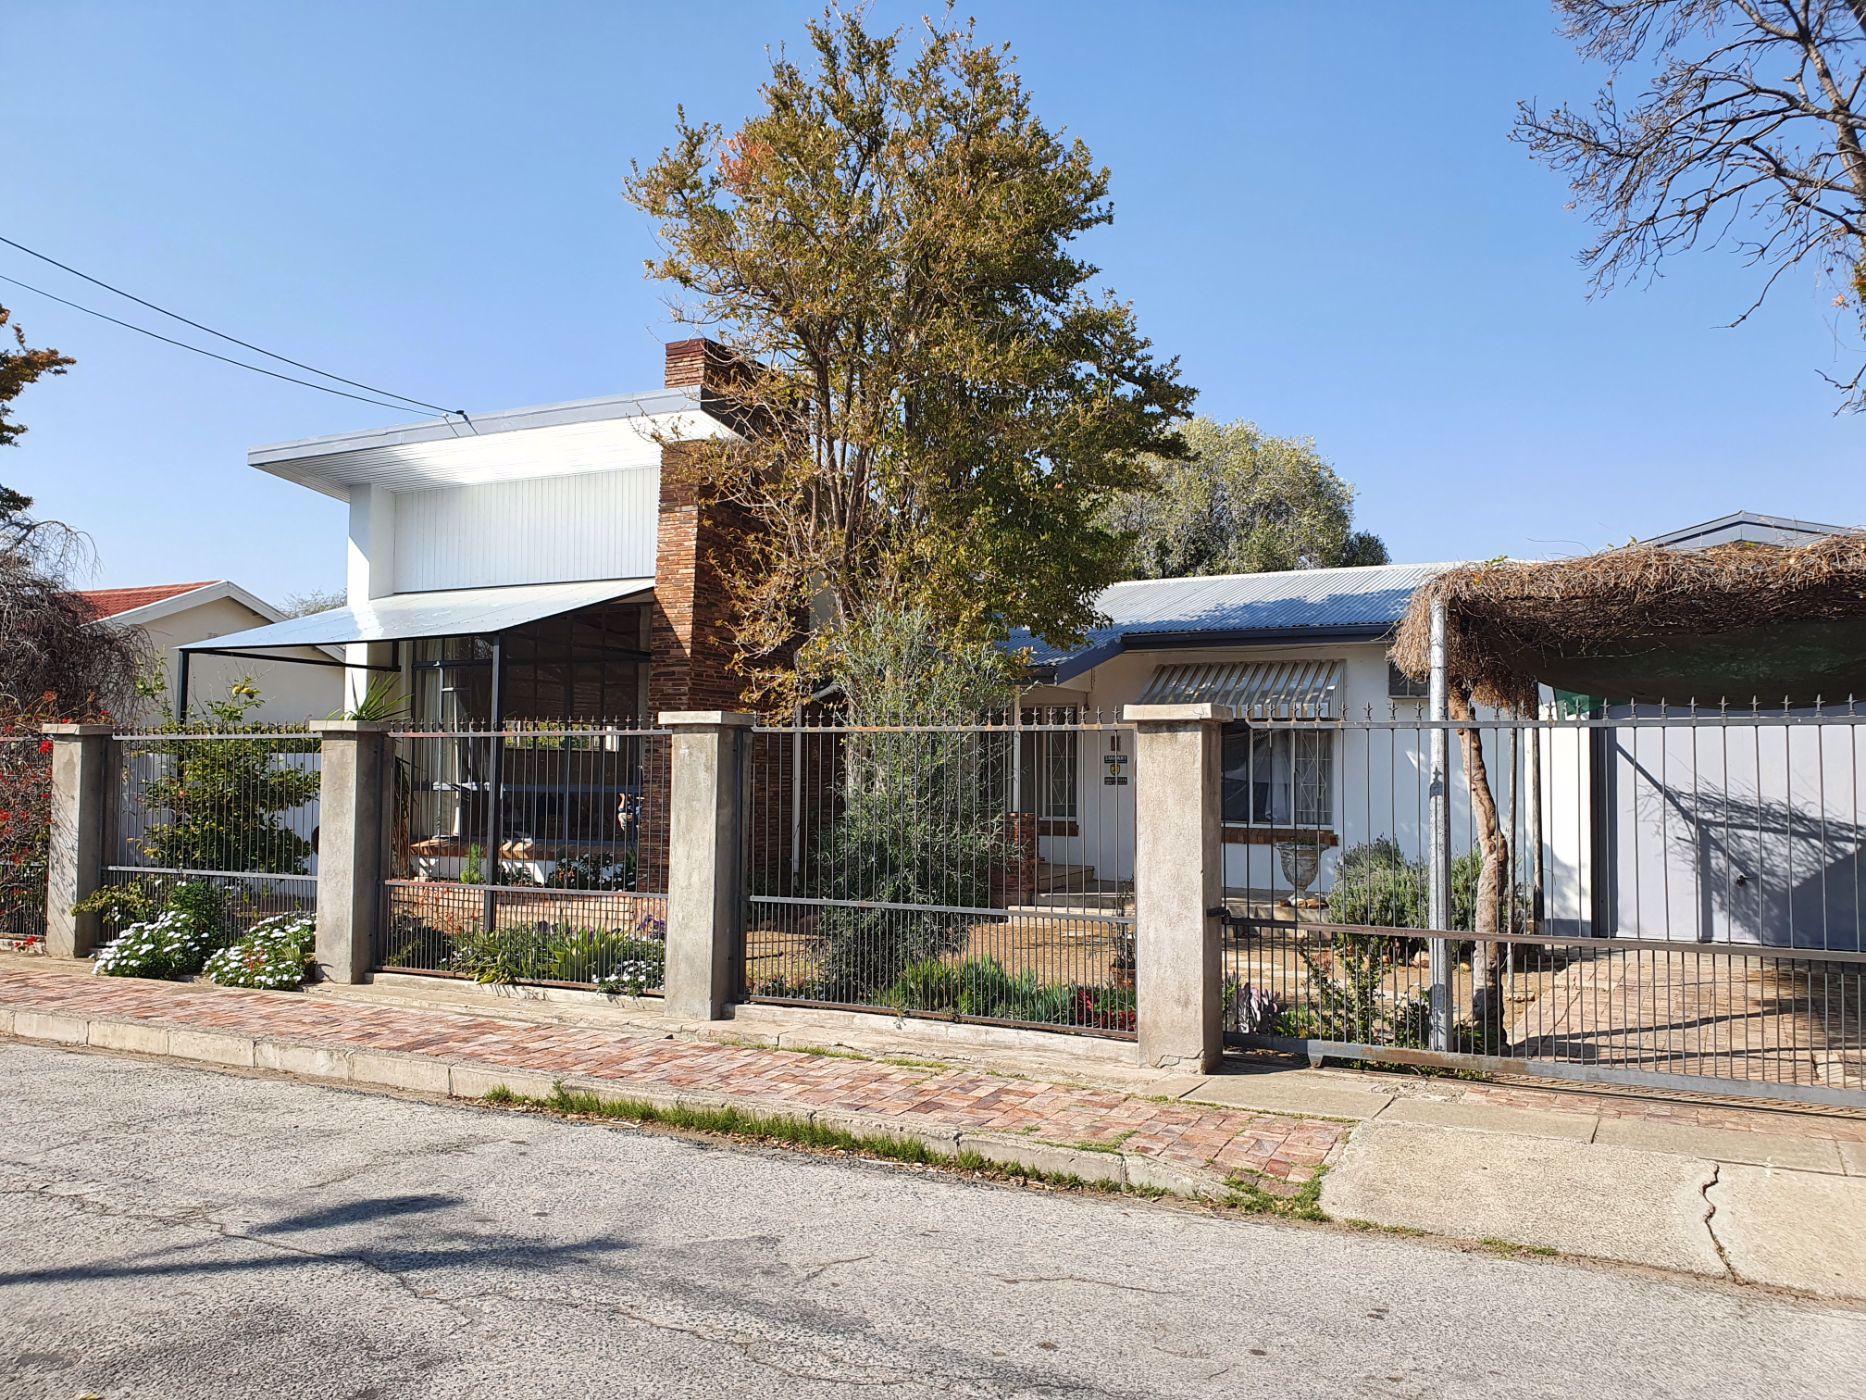 4 bedroom house for sale in Graaff-Reinet